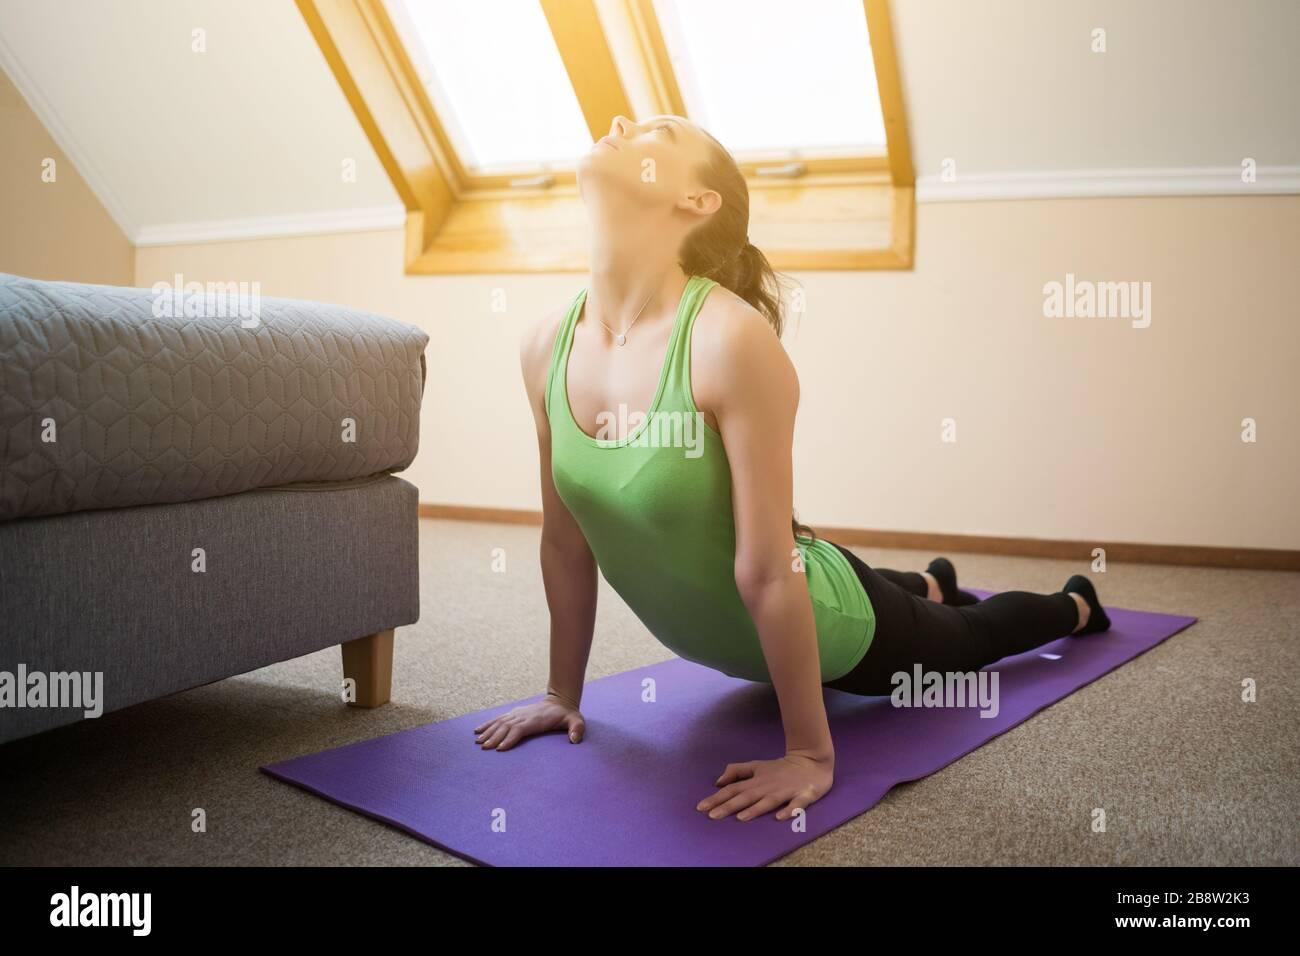 Junge Frau übt zu Hause Yoga aus. Bhujangasana/Cobra Posieren Stockfoto